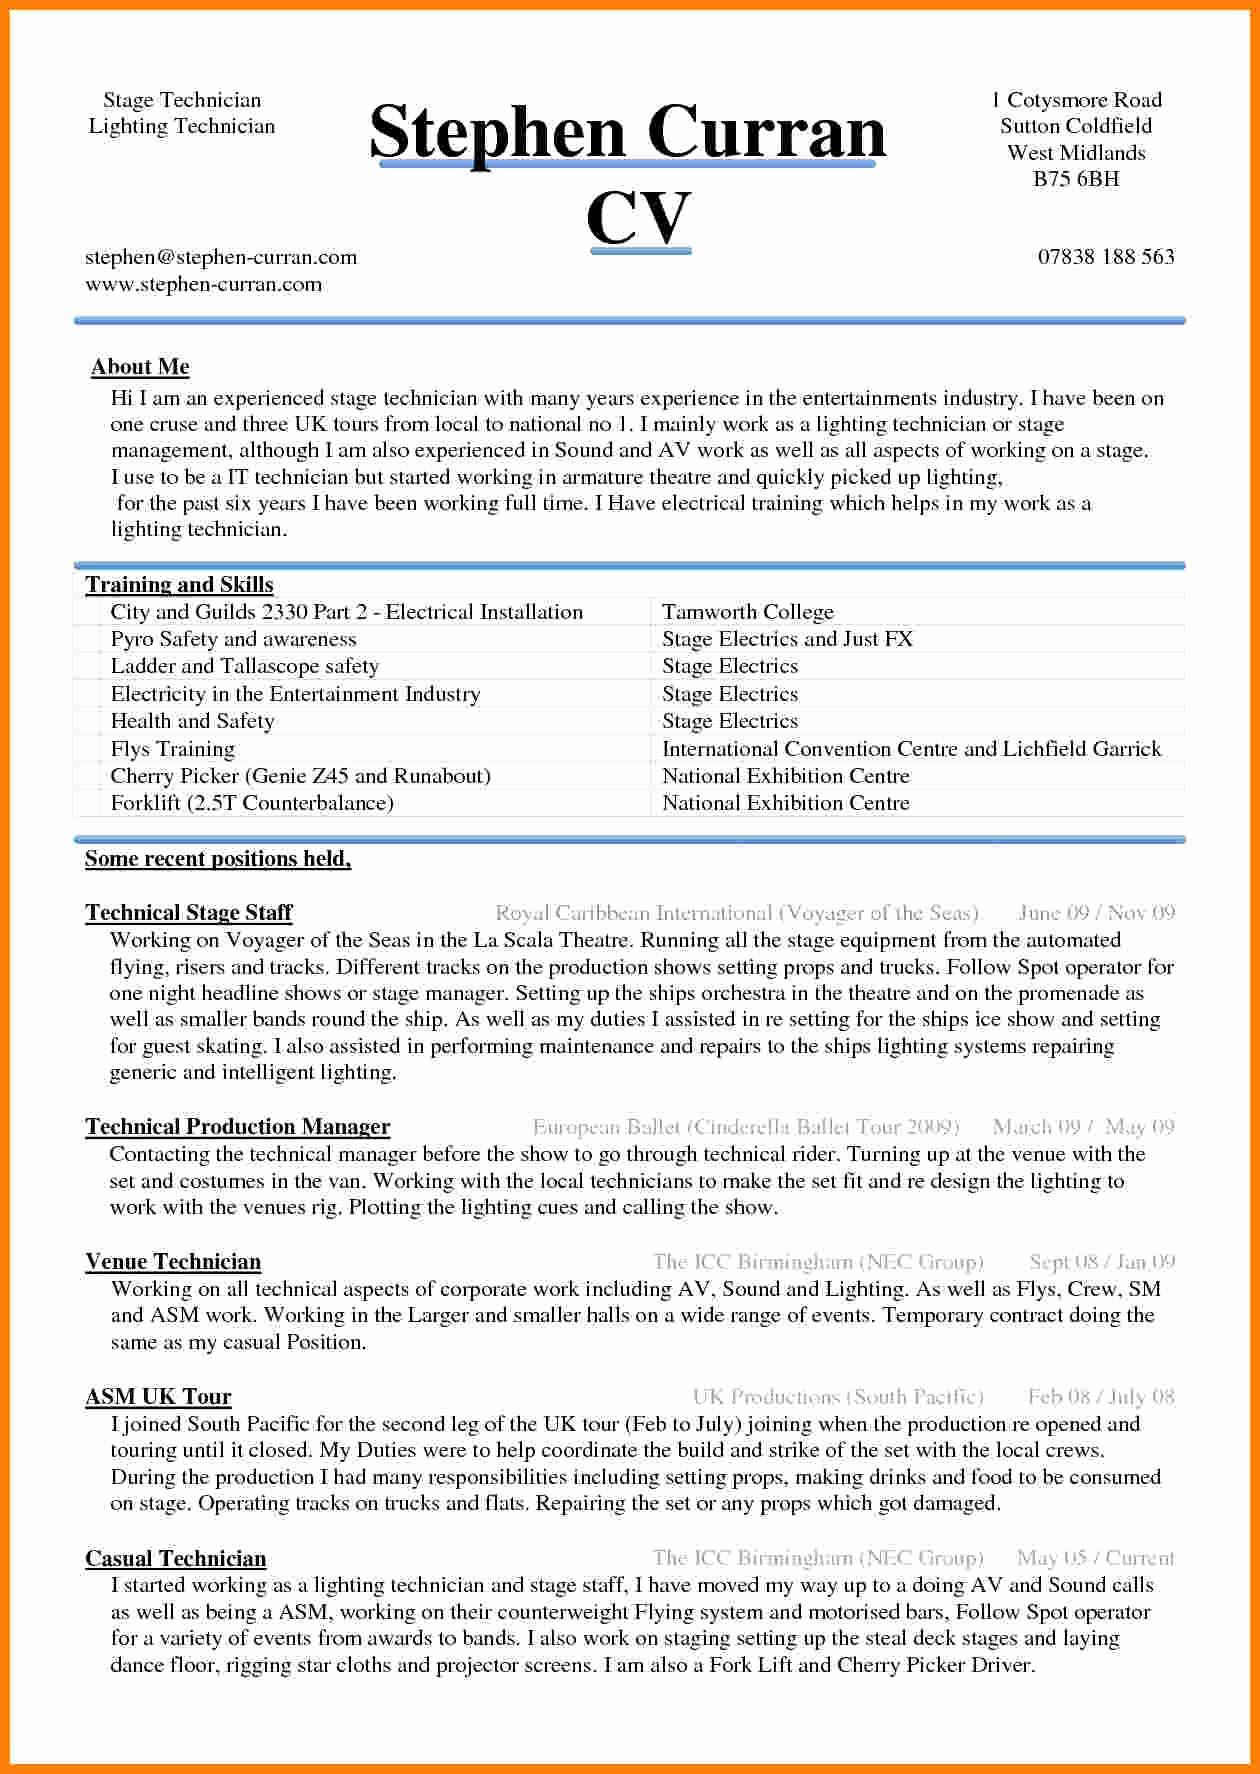 Resume Examples In Word format Luxury 5 Cv Sample Word Document